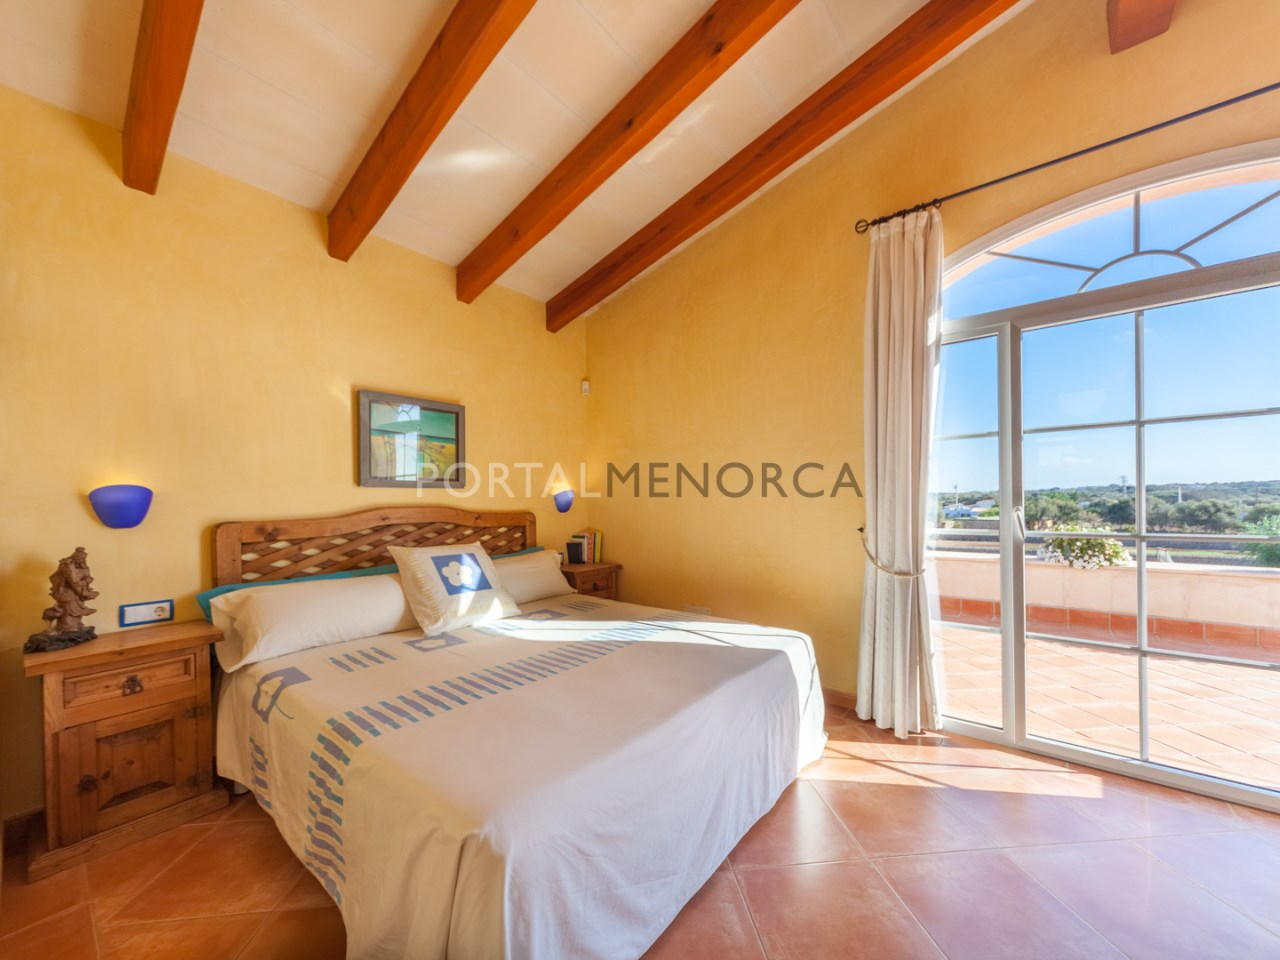 Casa de campo con piscina en Menorca (21 de 41)